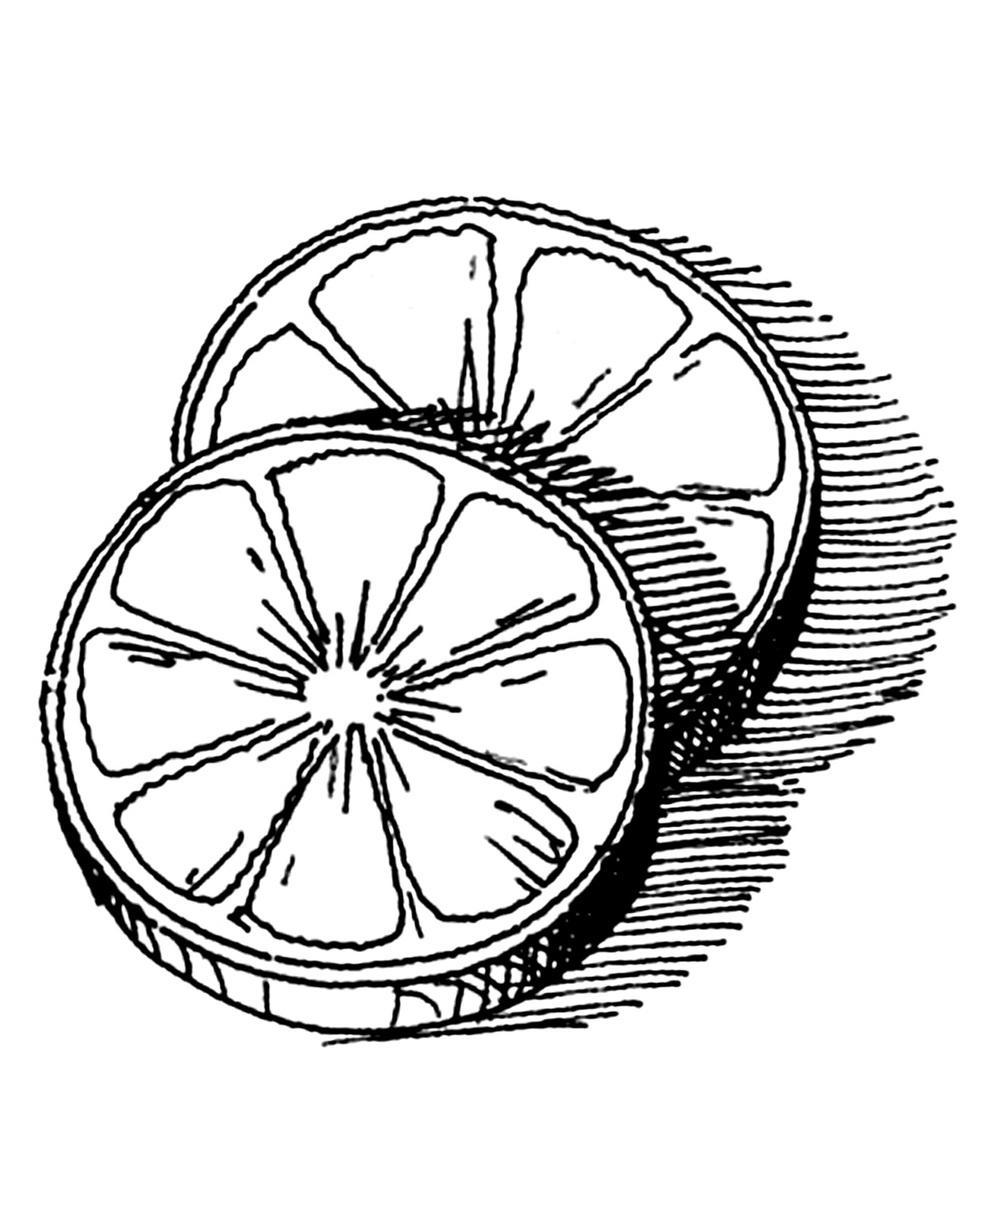 Lemon Line Drawing